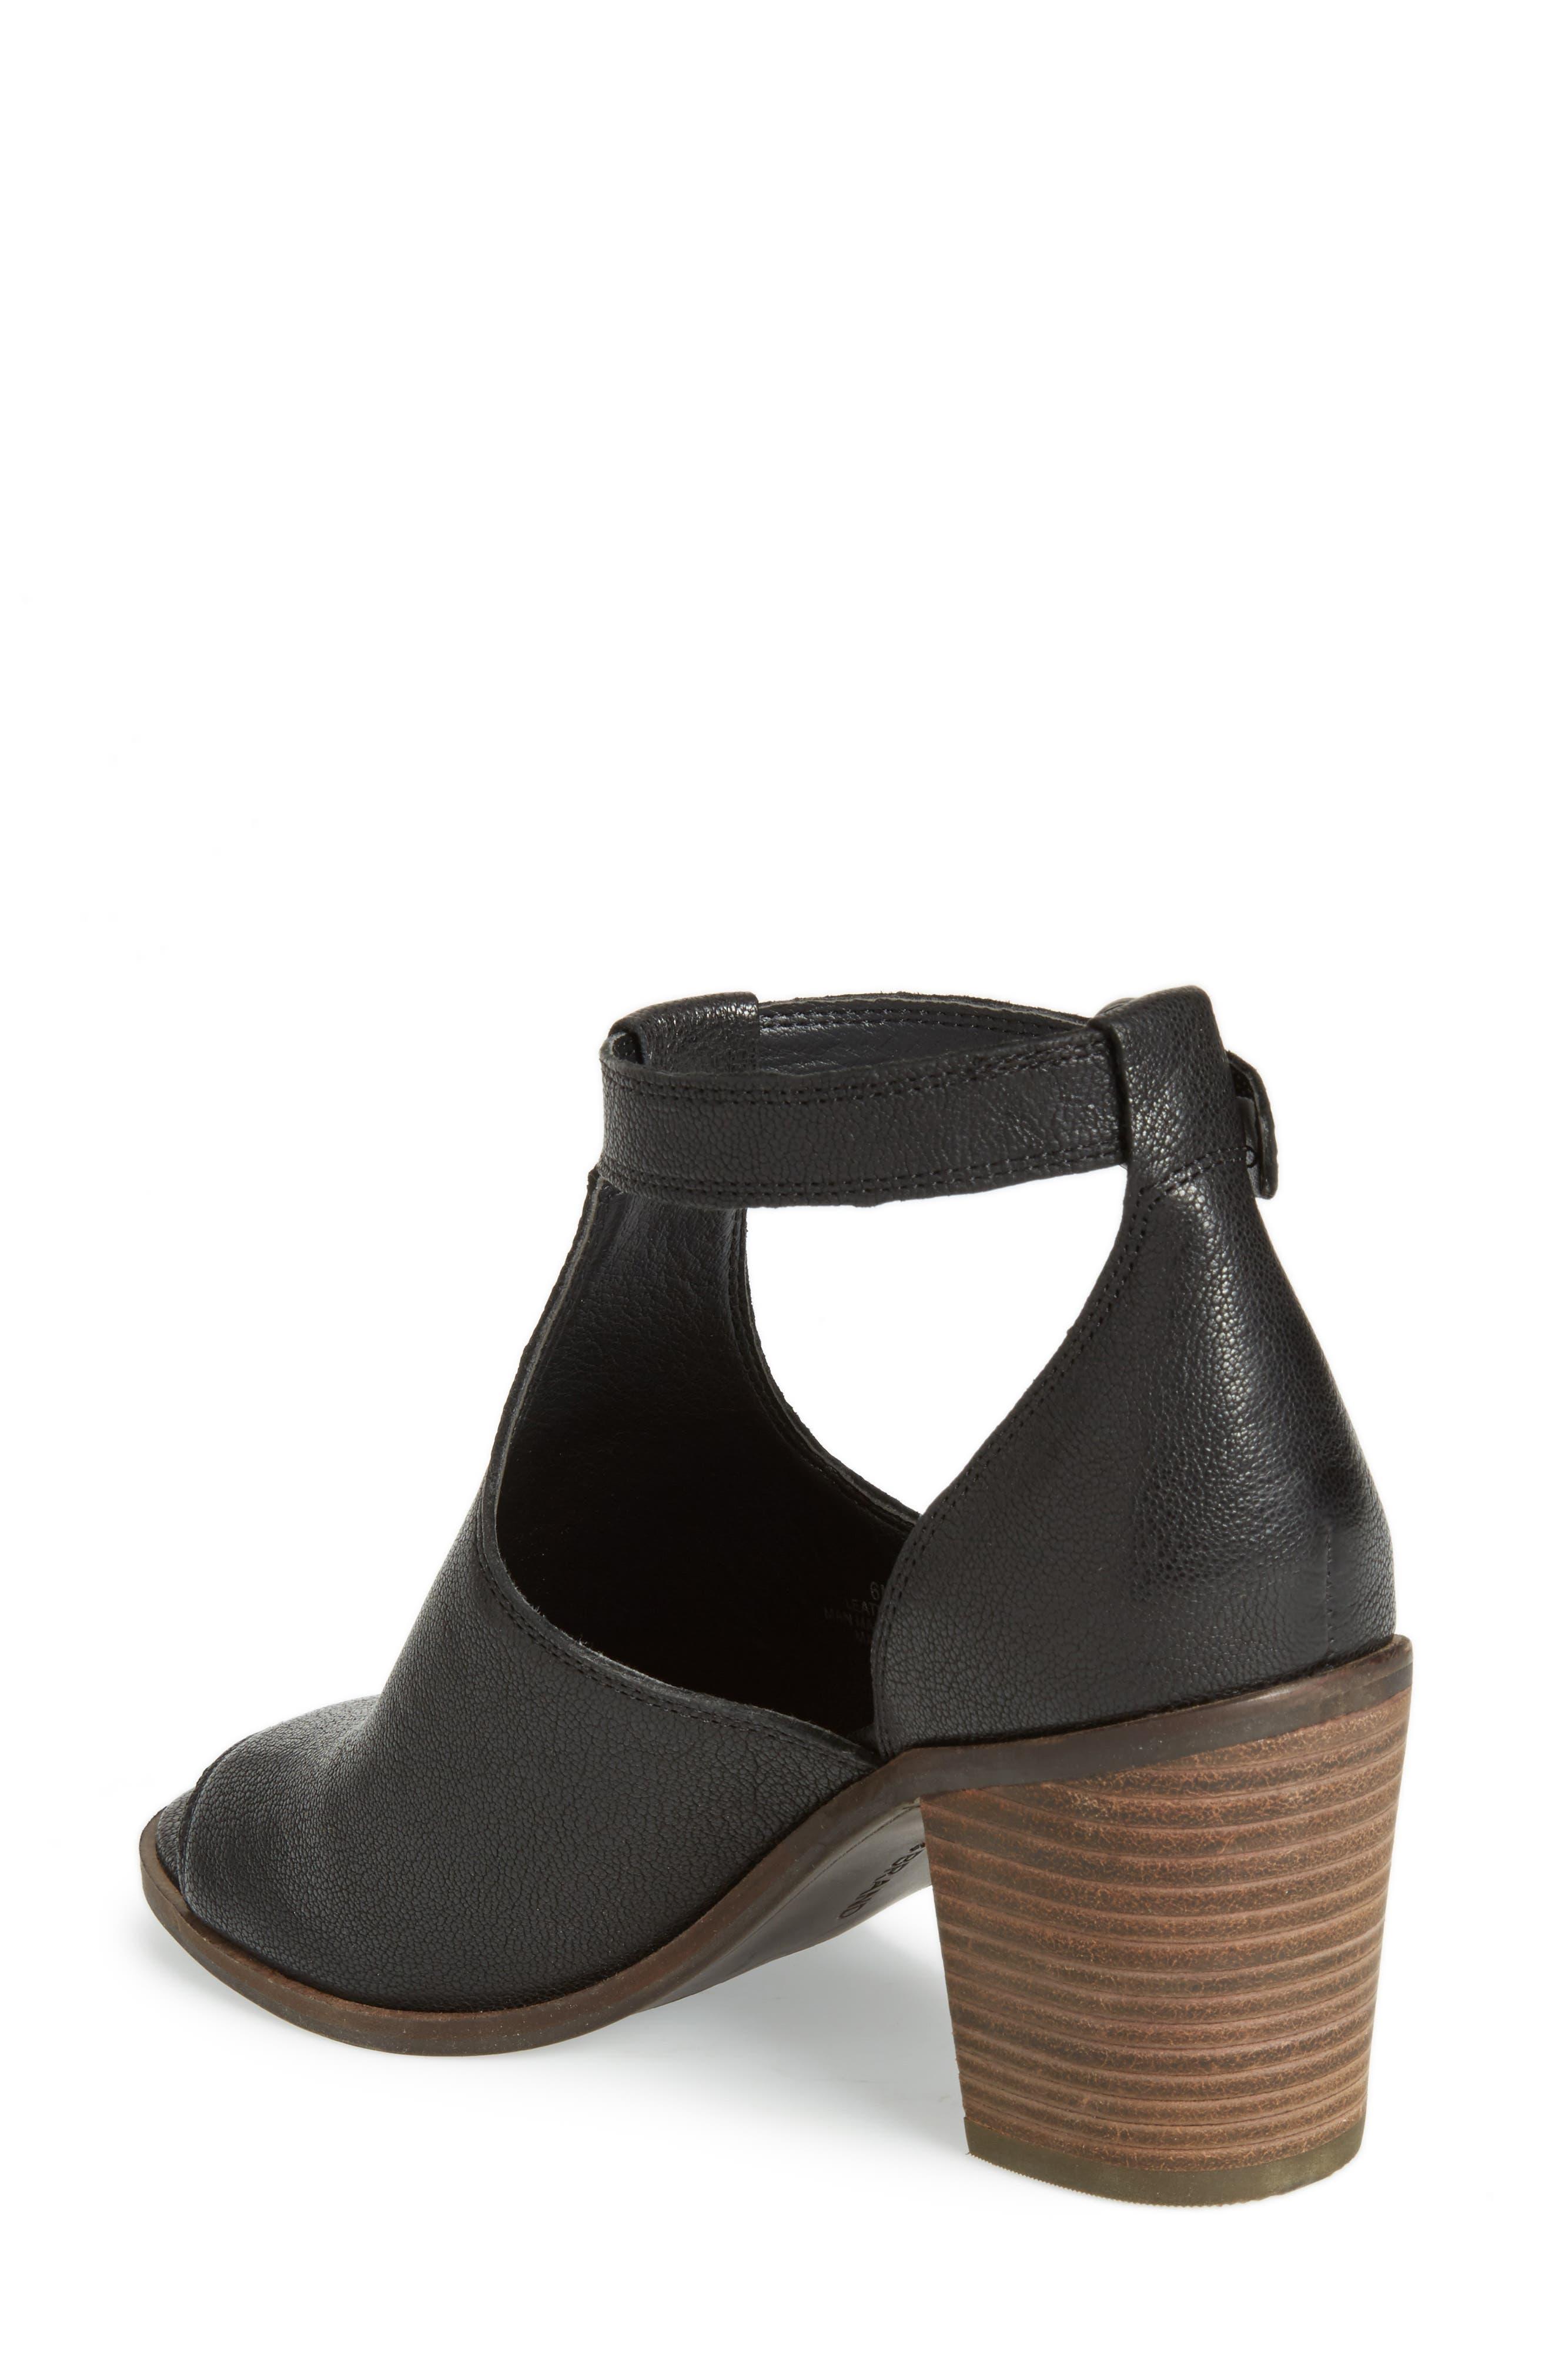 Kadian Block Heel Sandal,                             Alternate thumbnail 3, color,